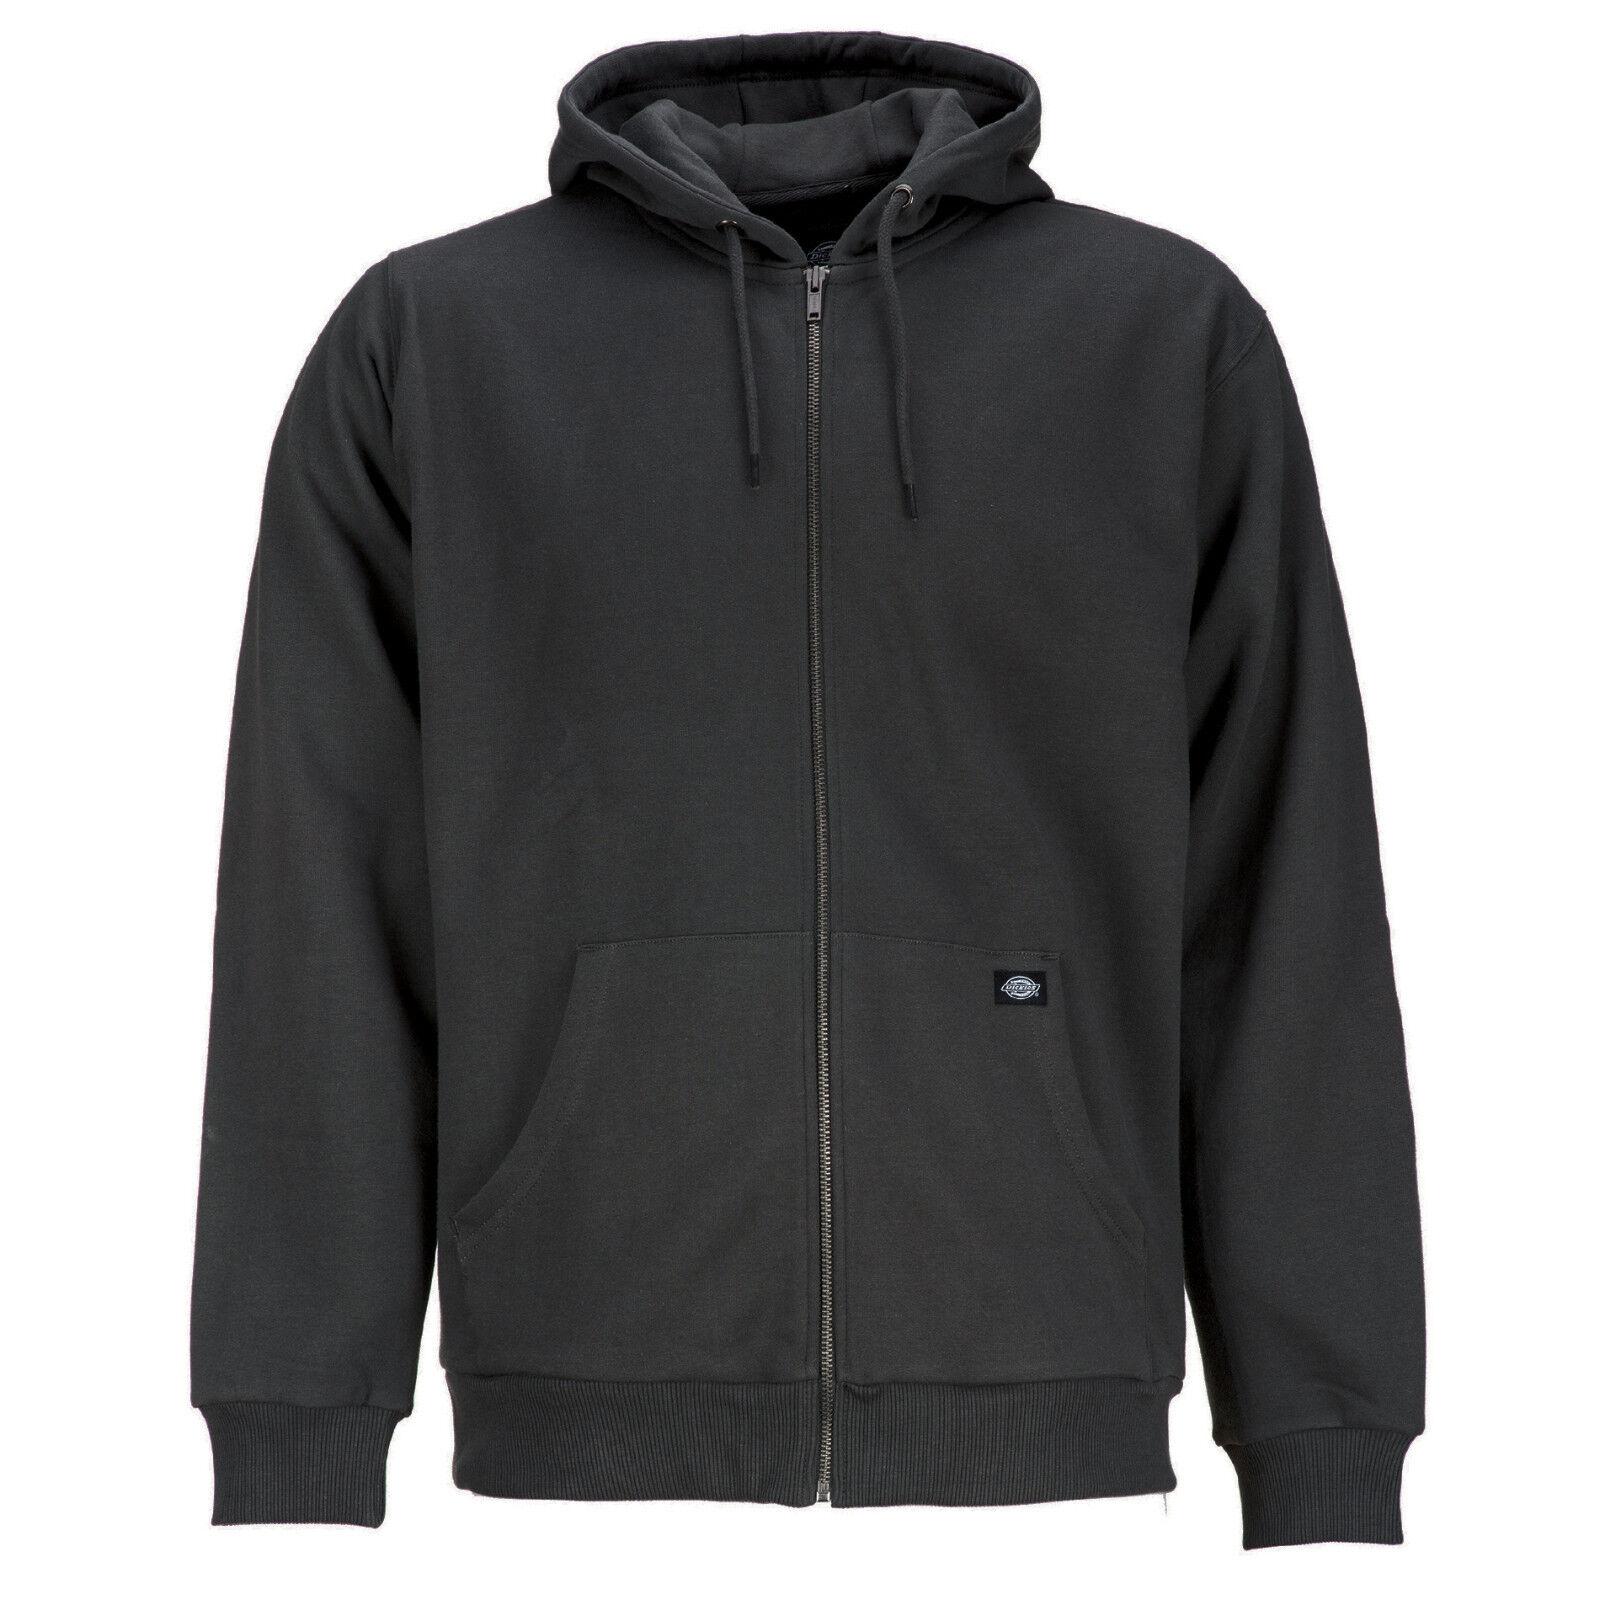 Dickies-Kingsley Hoodie con Cappuccio Pullover Sweater Zip Vari Colorei